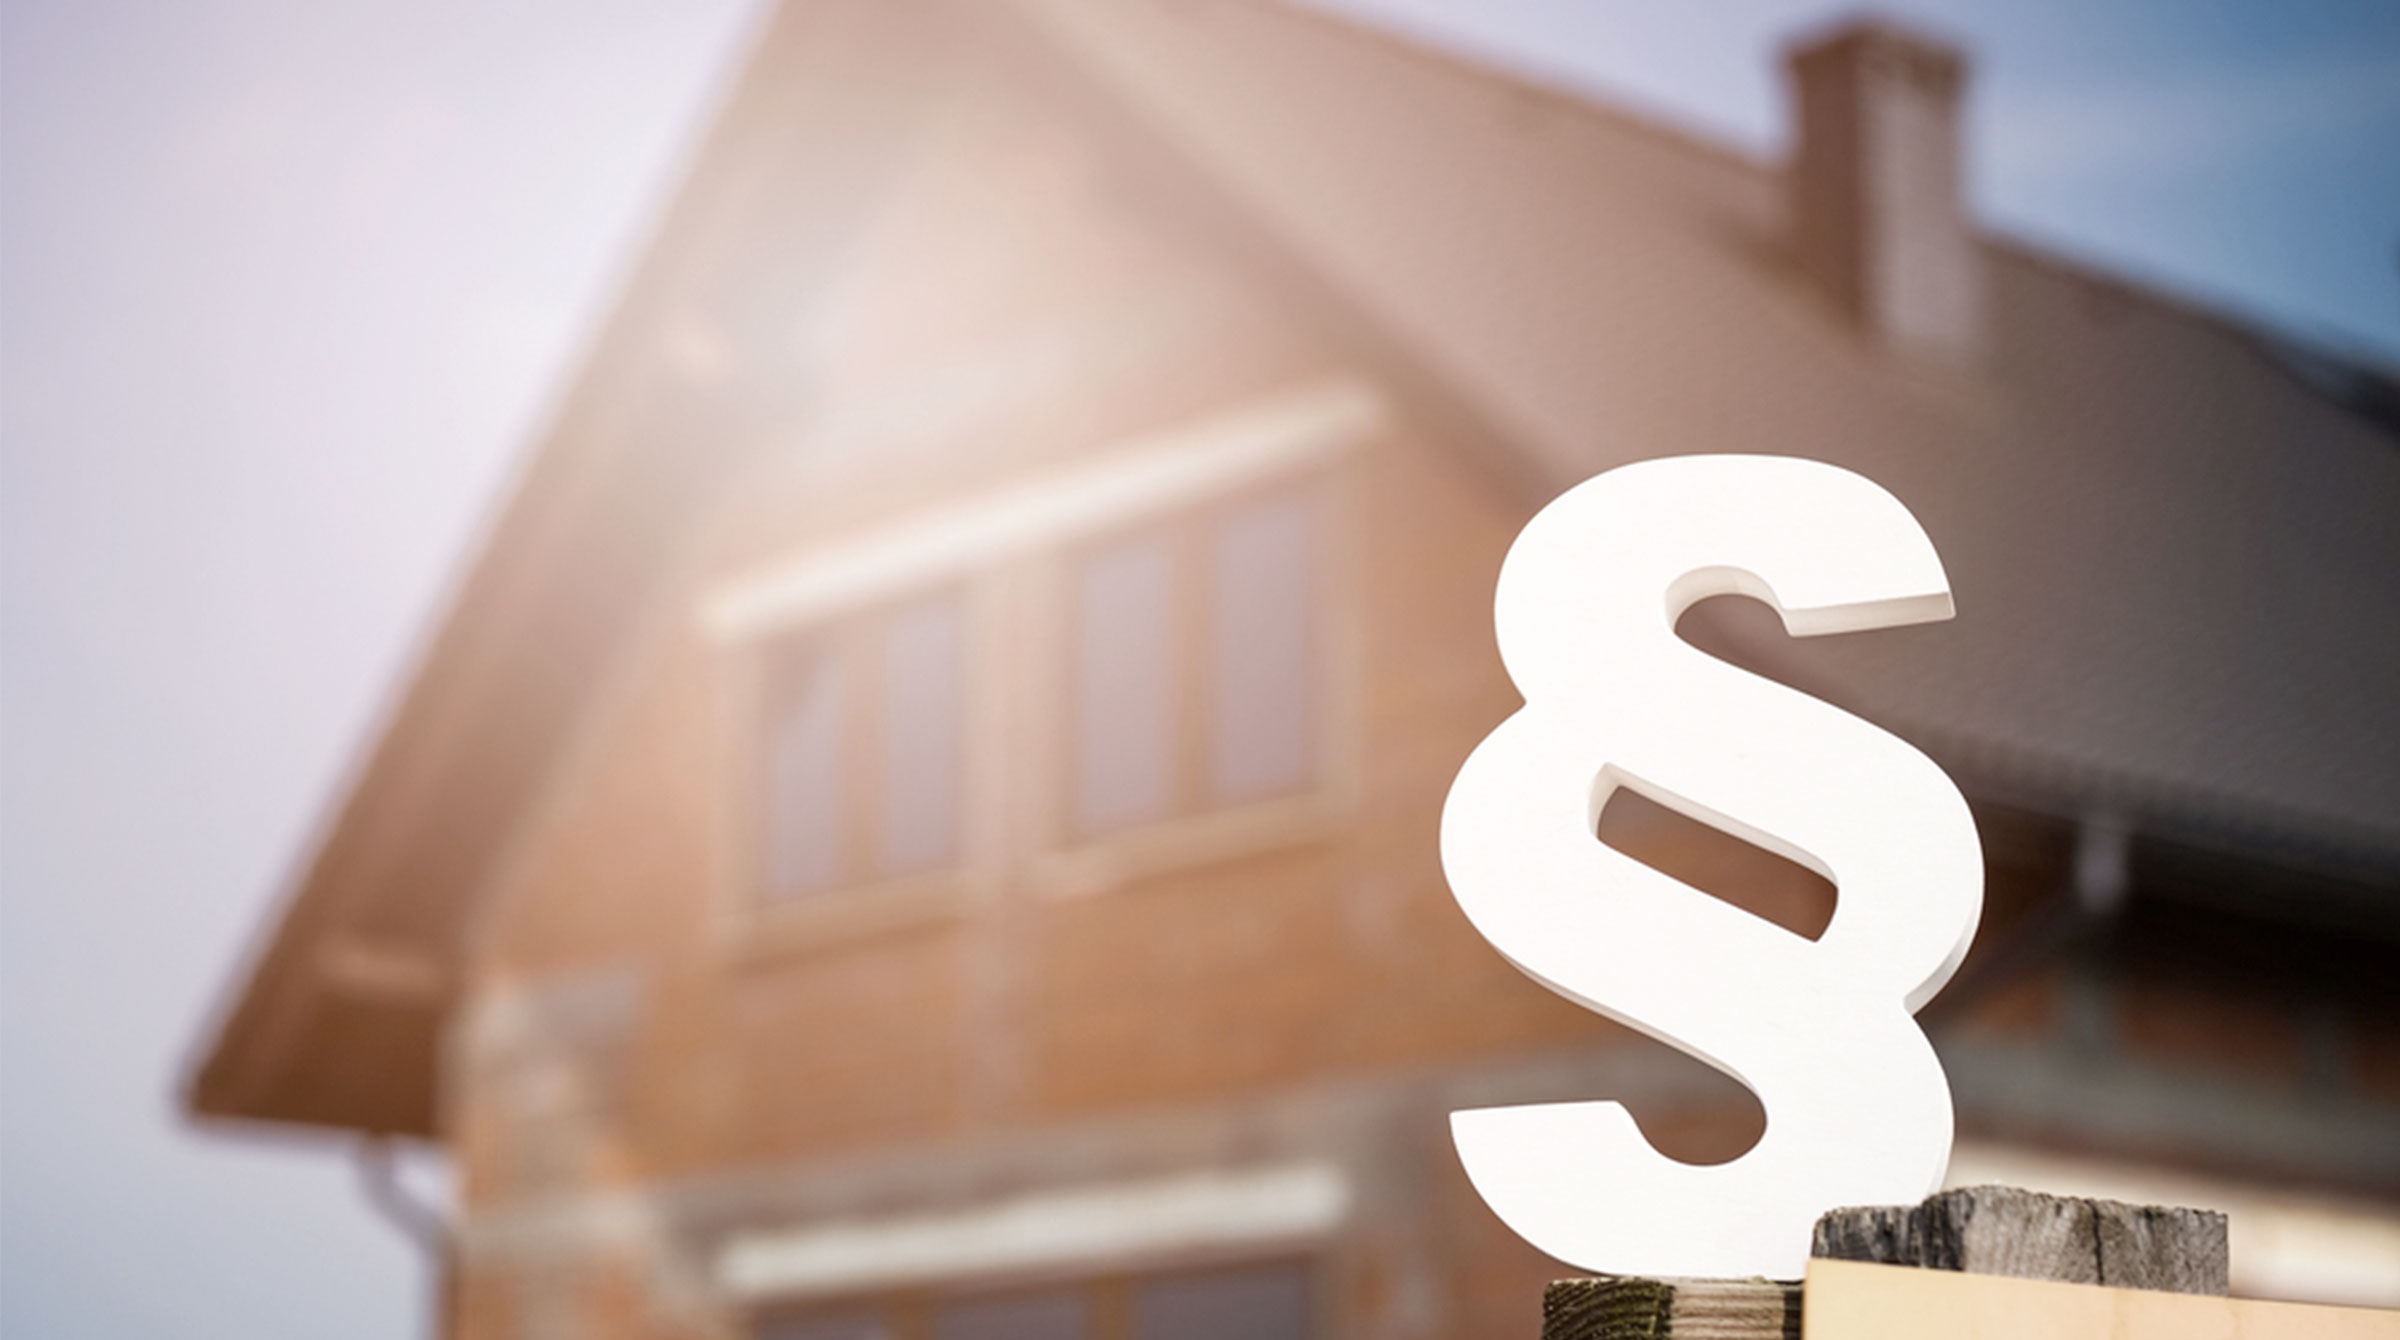 Introbild Sonderkündigungsrecht Baufinanzierung